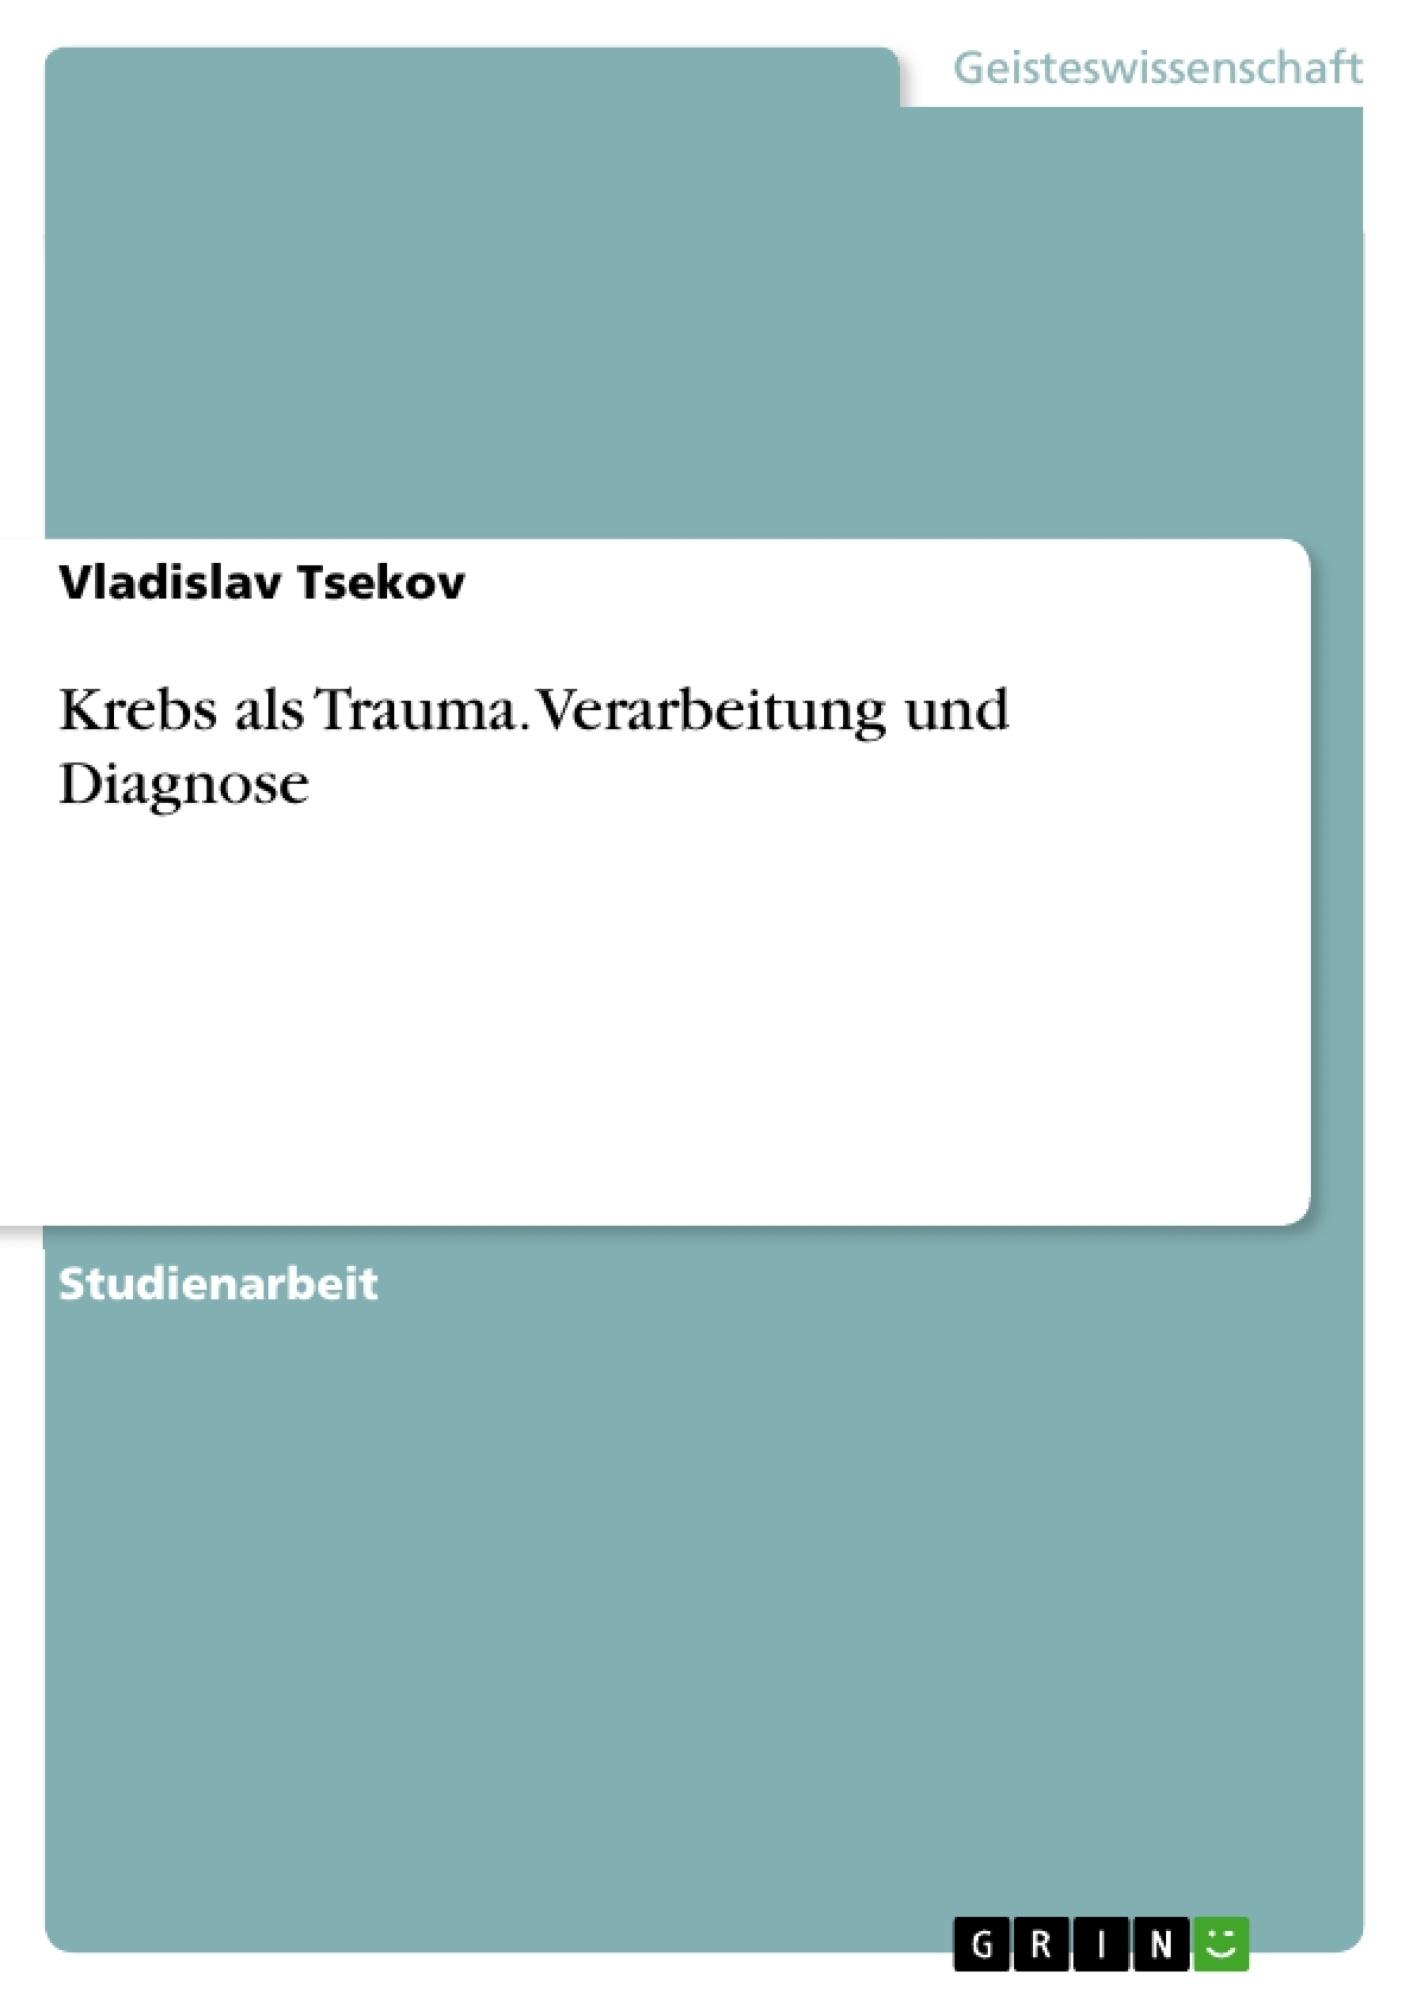 Titel: Krebs als Trauma. Verarbeitung und Diagnose